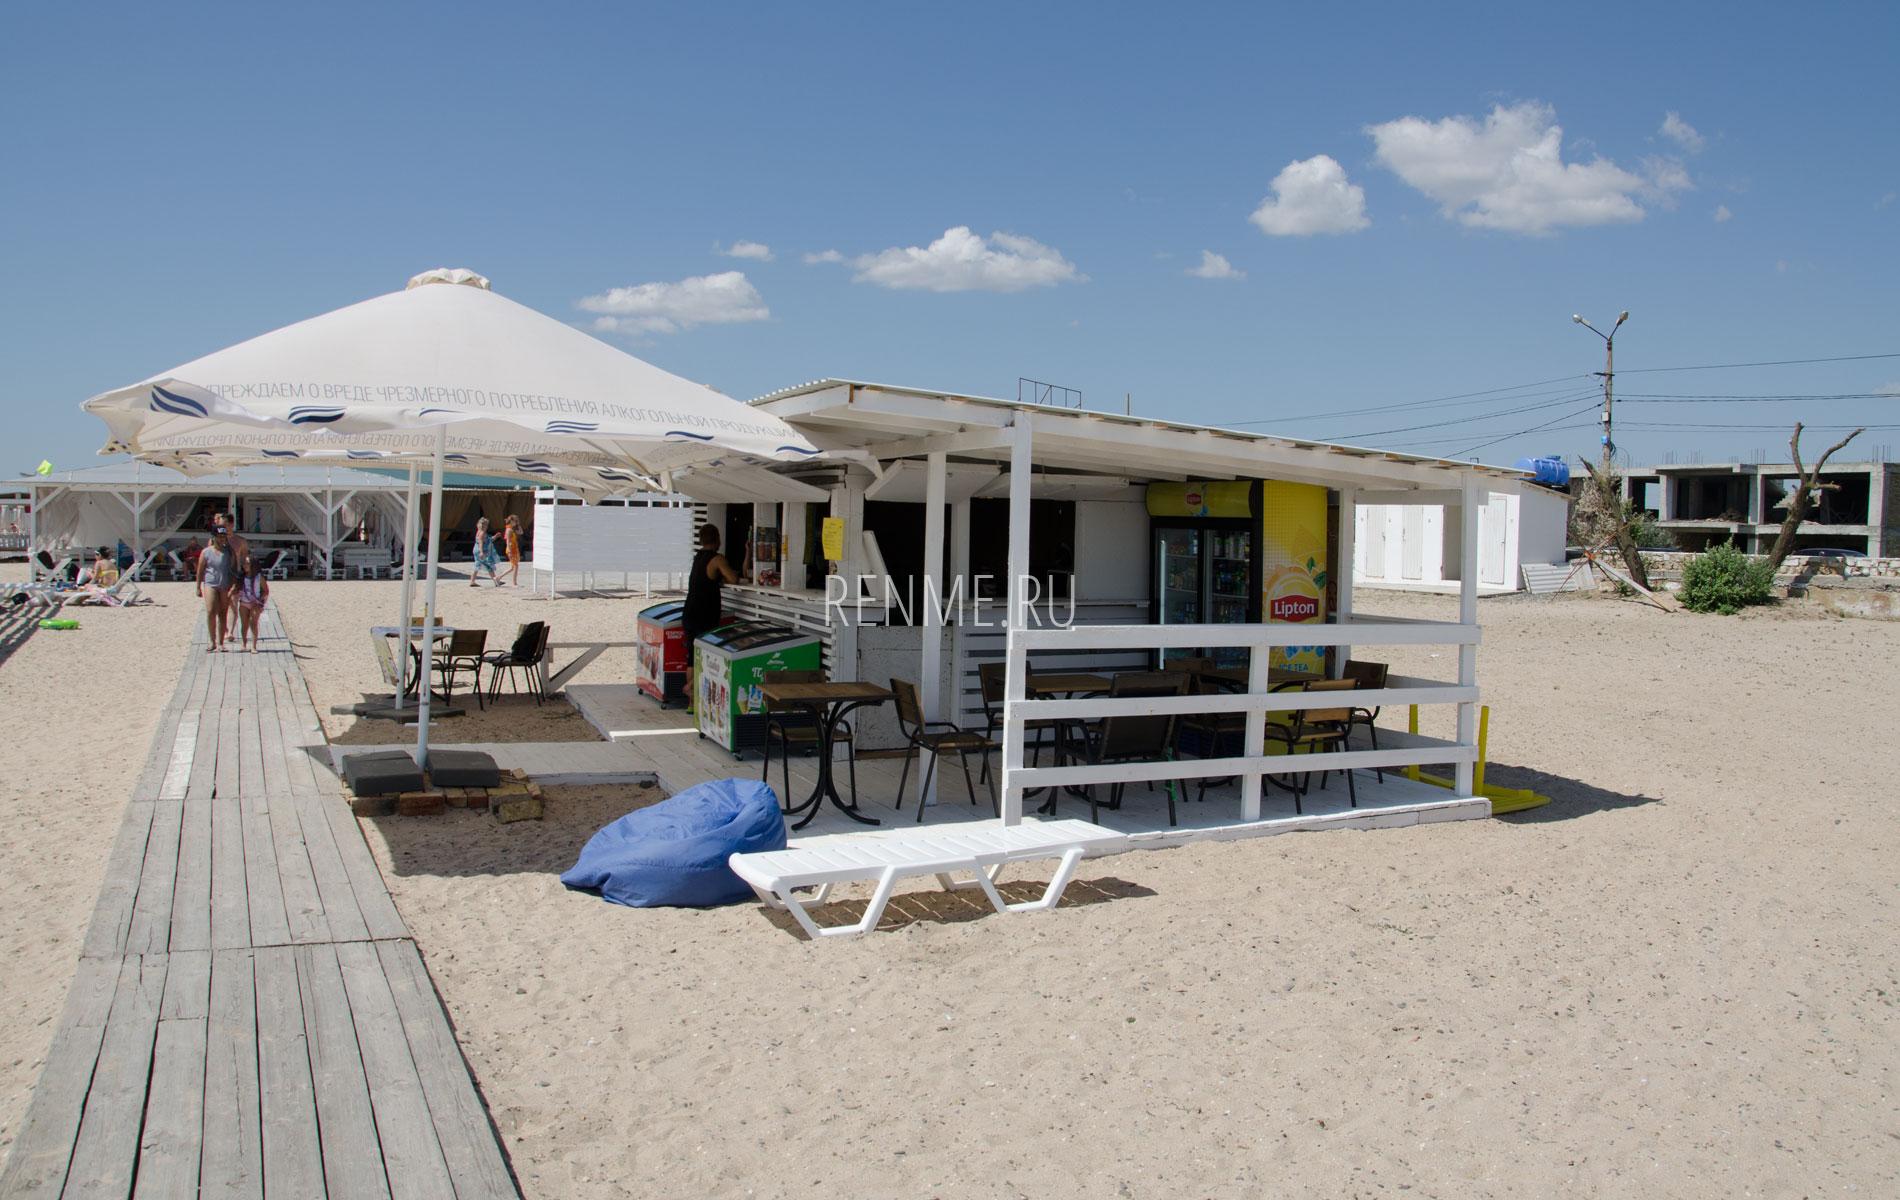 Кафе на песчаном пляже в сезон 2019. Фото Евпатории